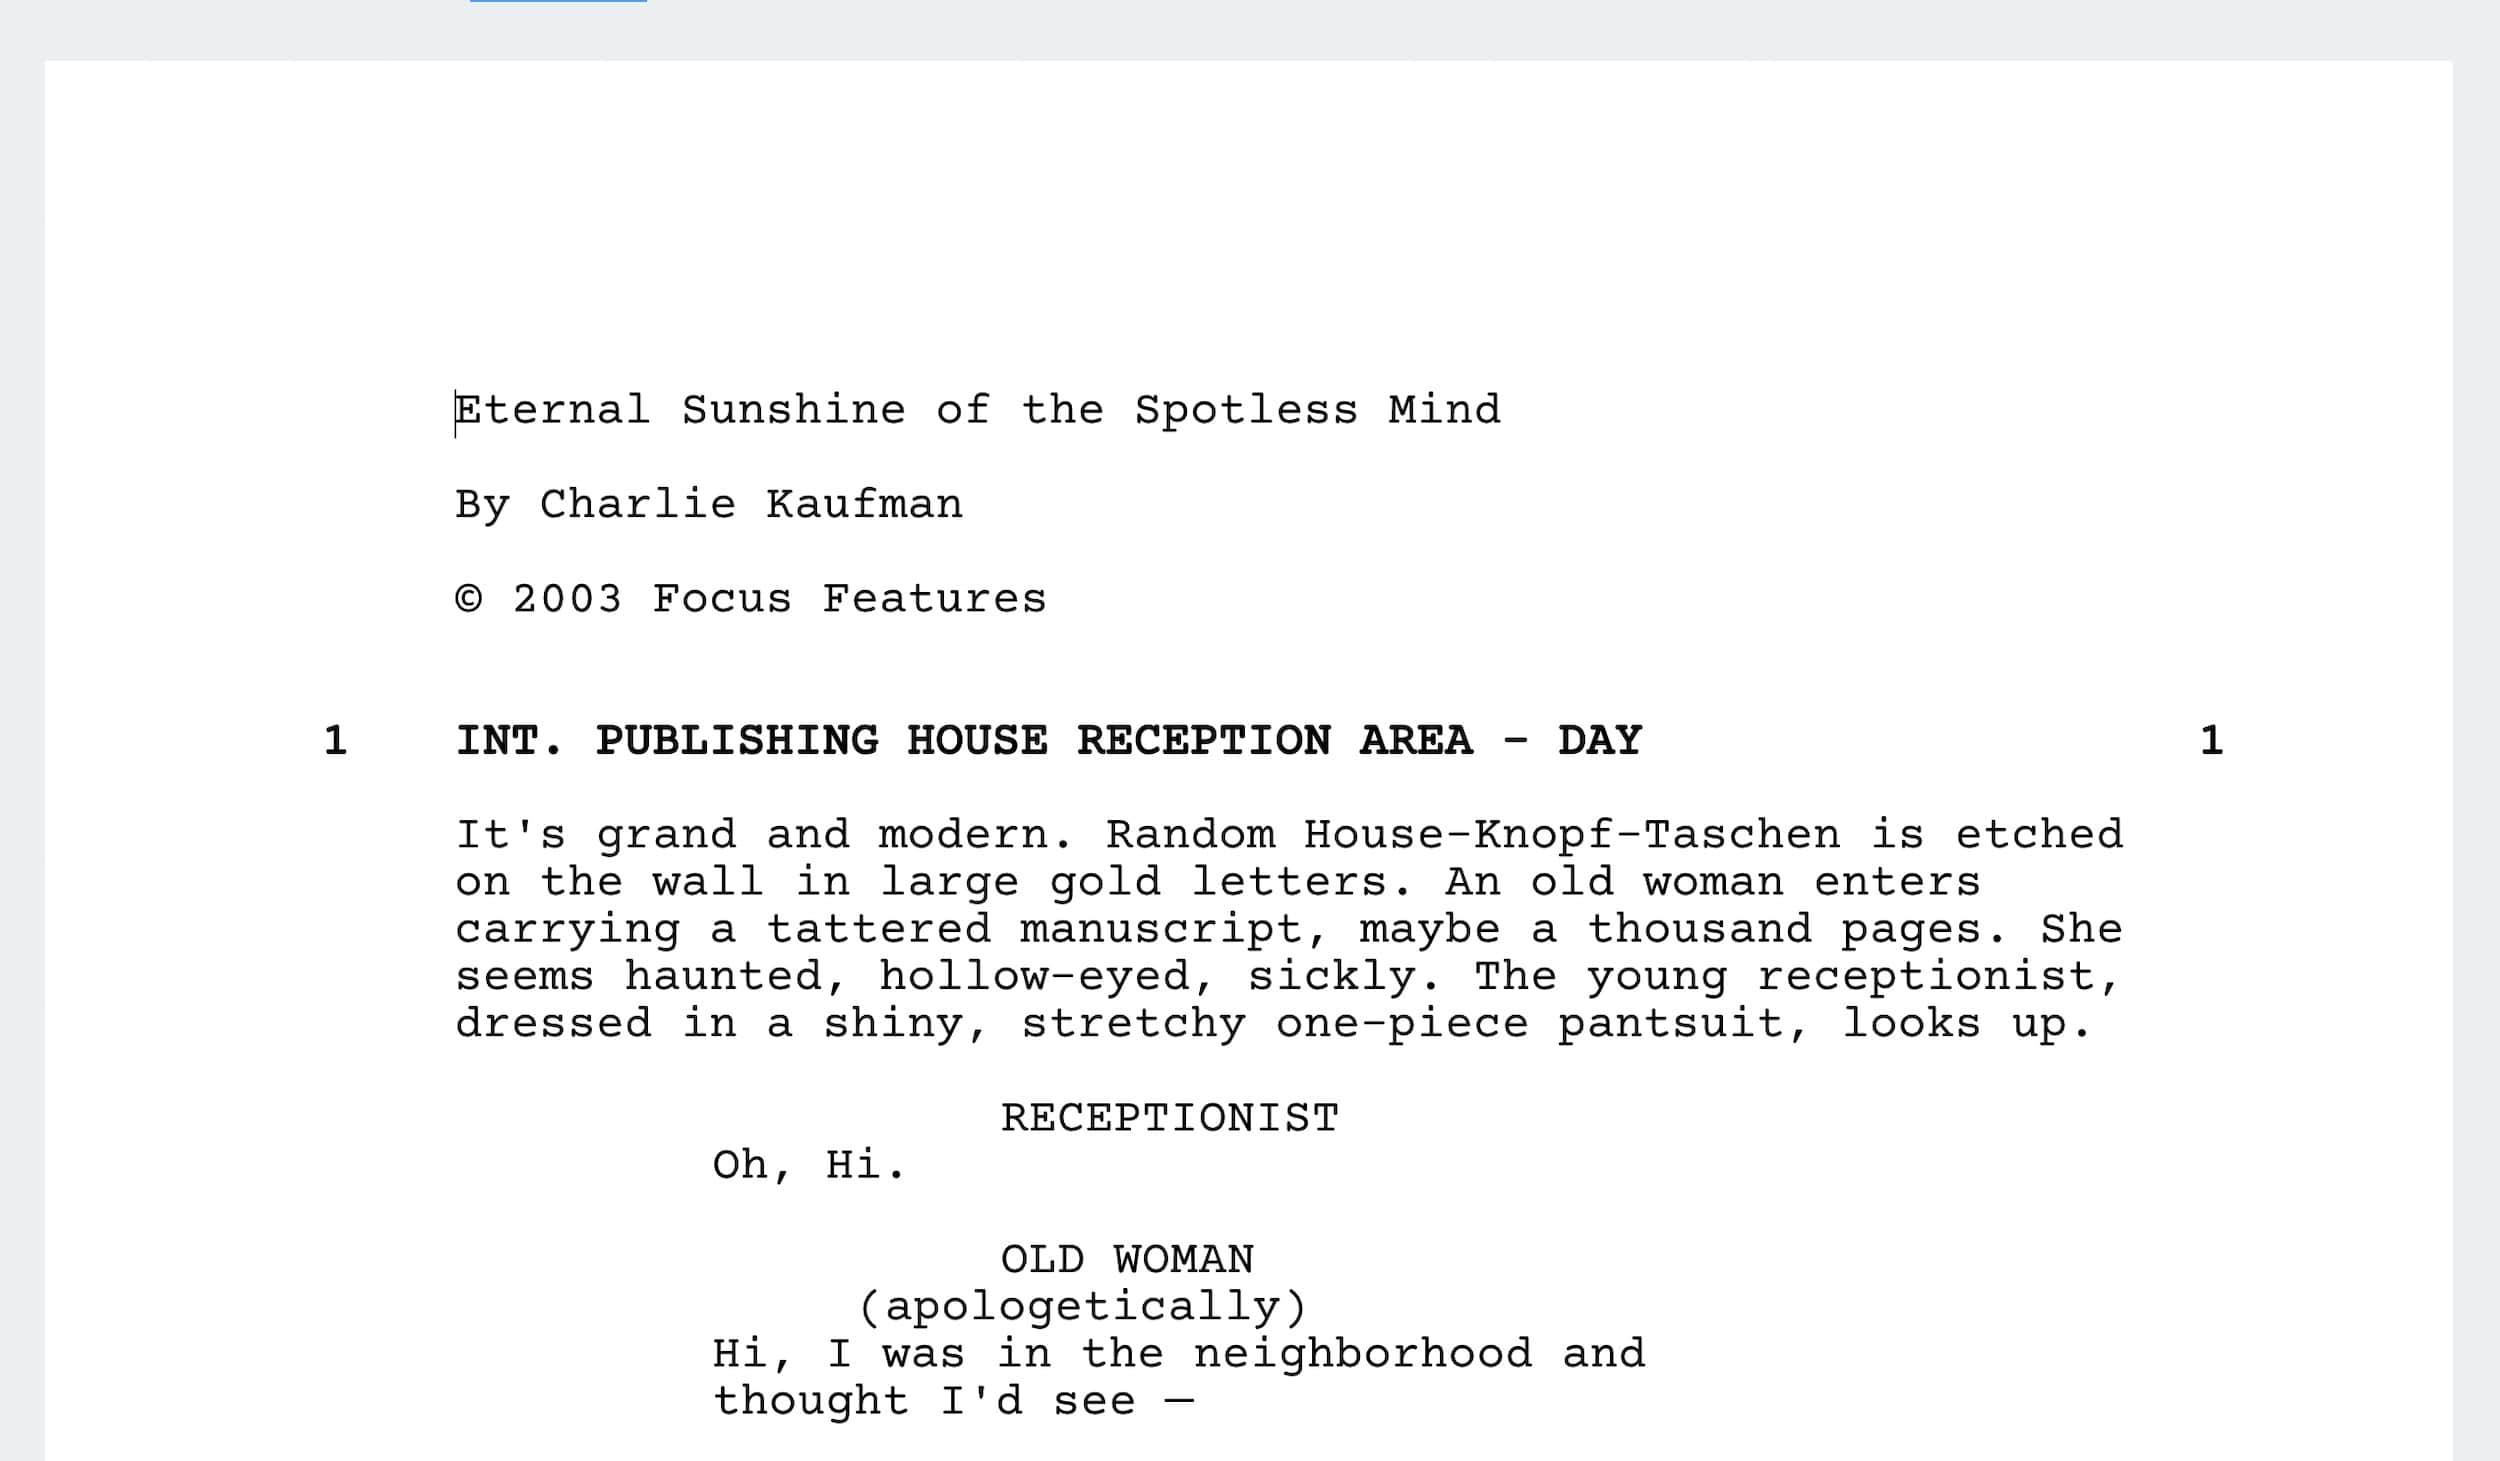 Best Charlie Kaufman Movies - Eternal Sunshine of the Spotless Mind - StudioBinder